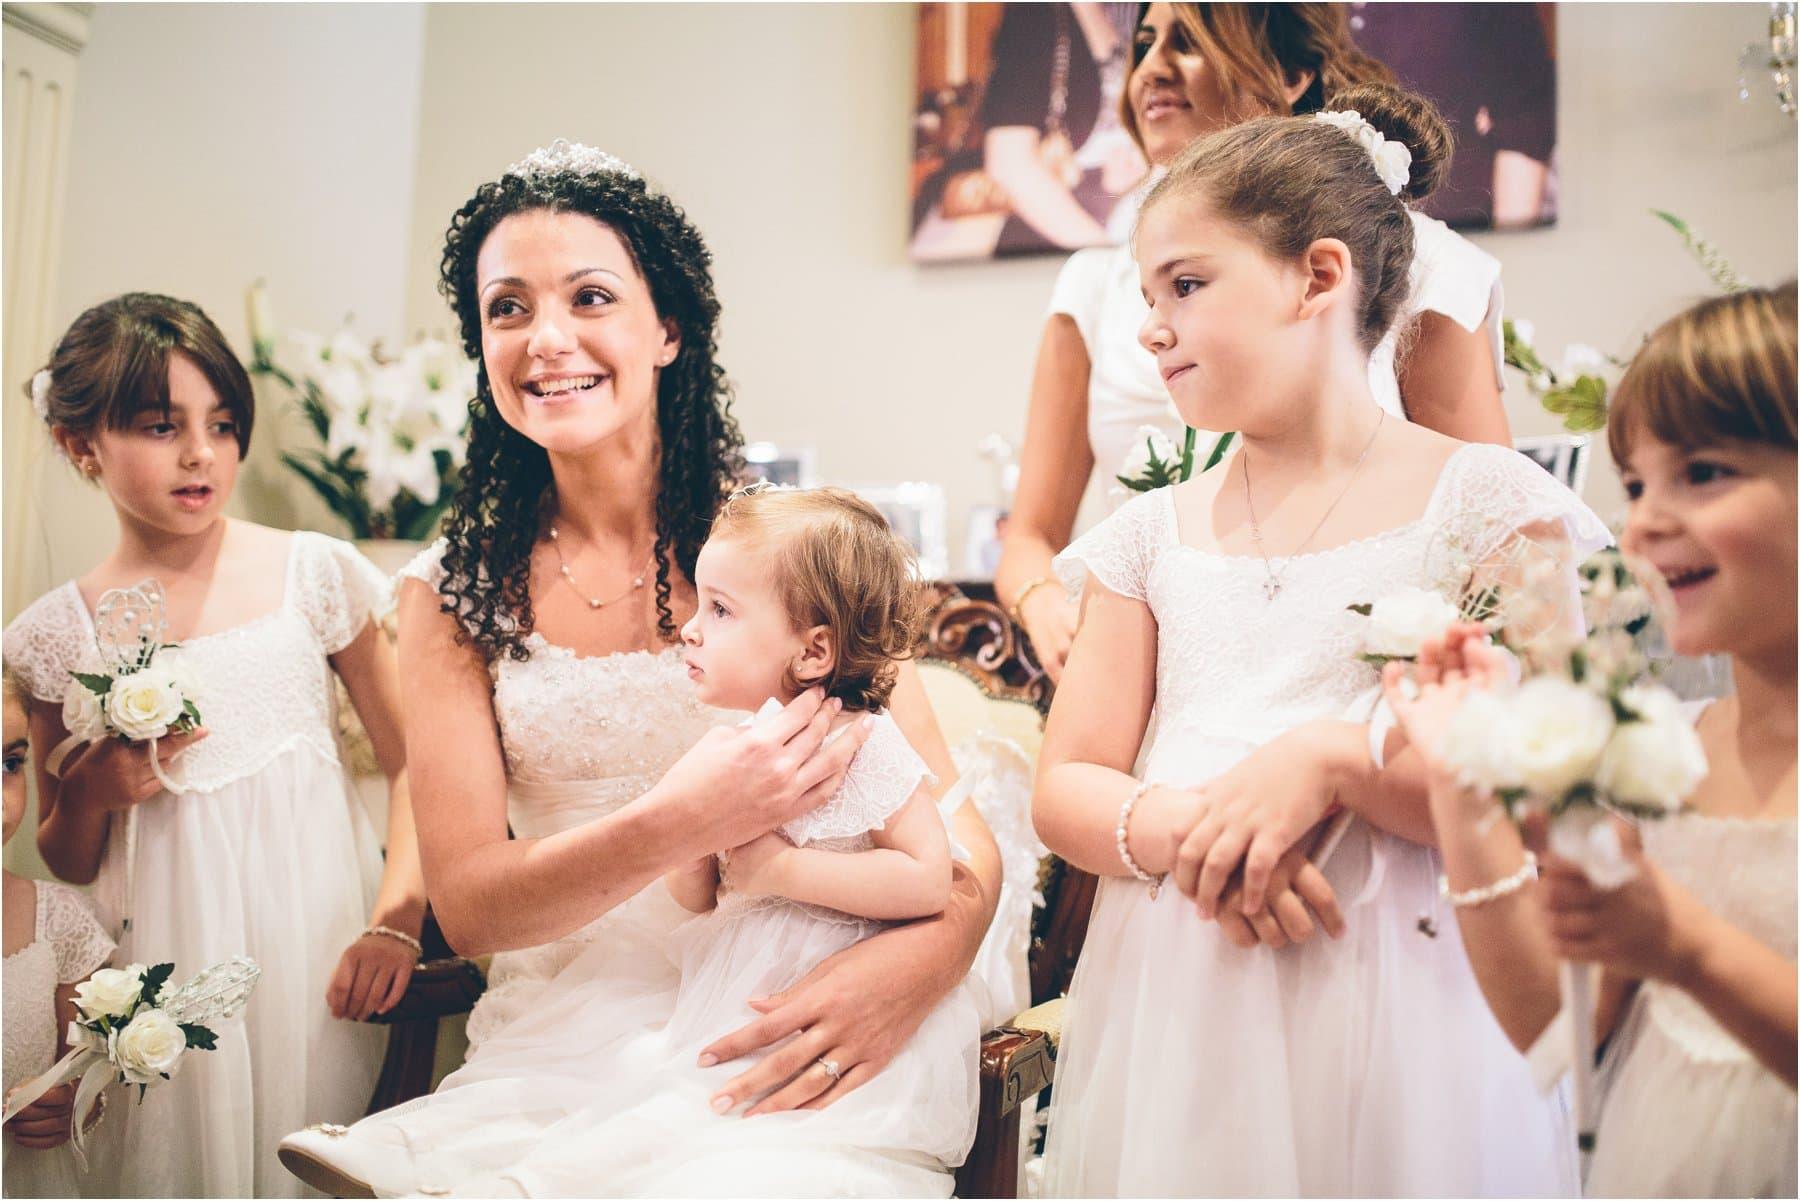 Midland_Manchester_Wedding_Photography_0046